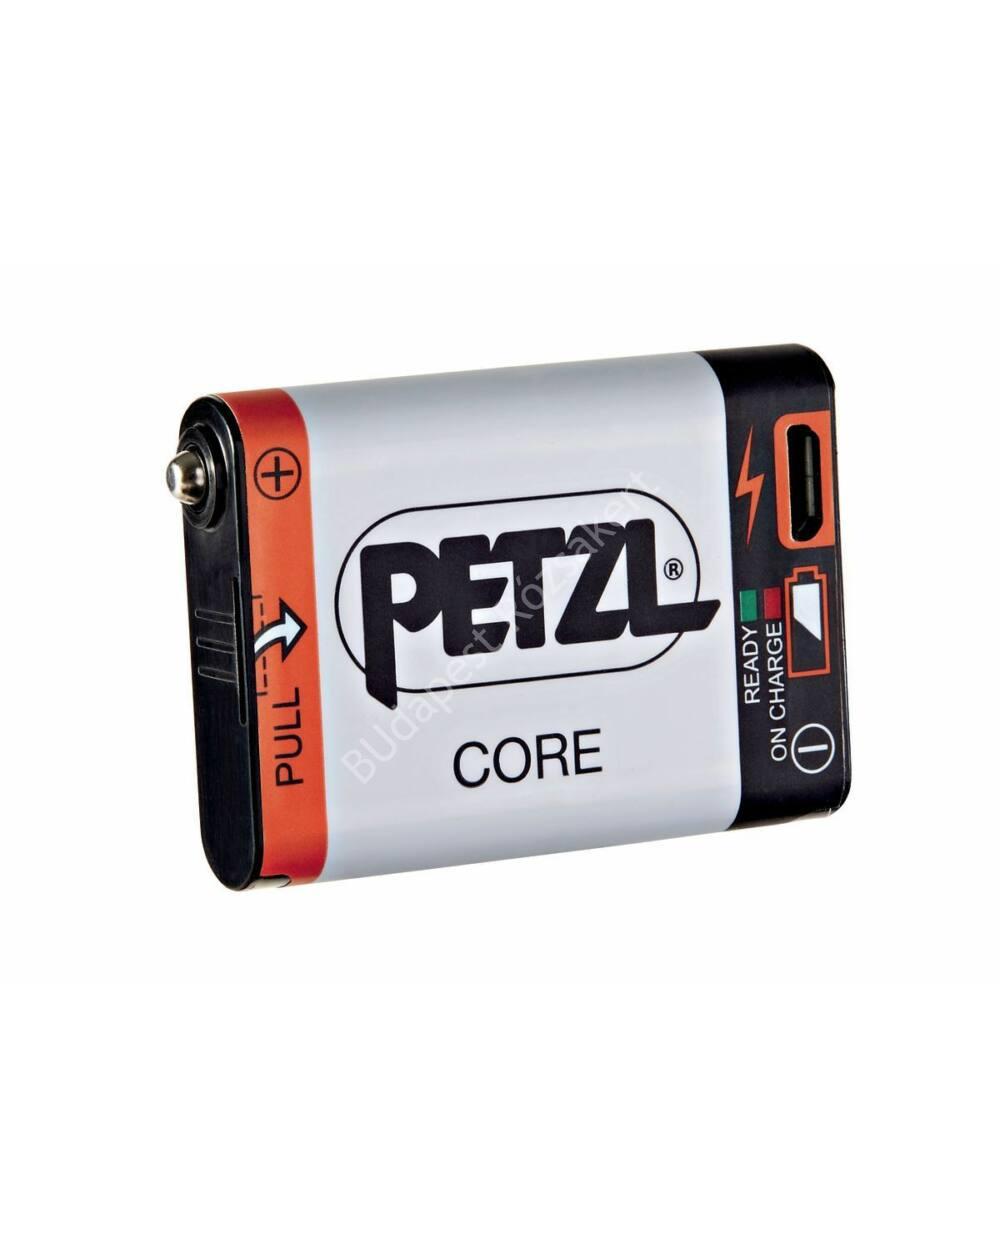 Petzl Core lítium-ion akkumulátor 1250mAh